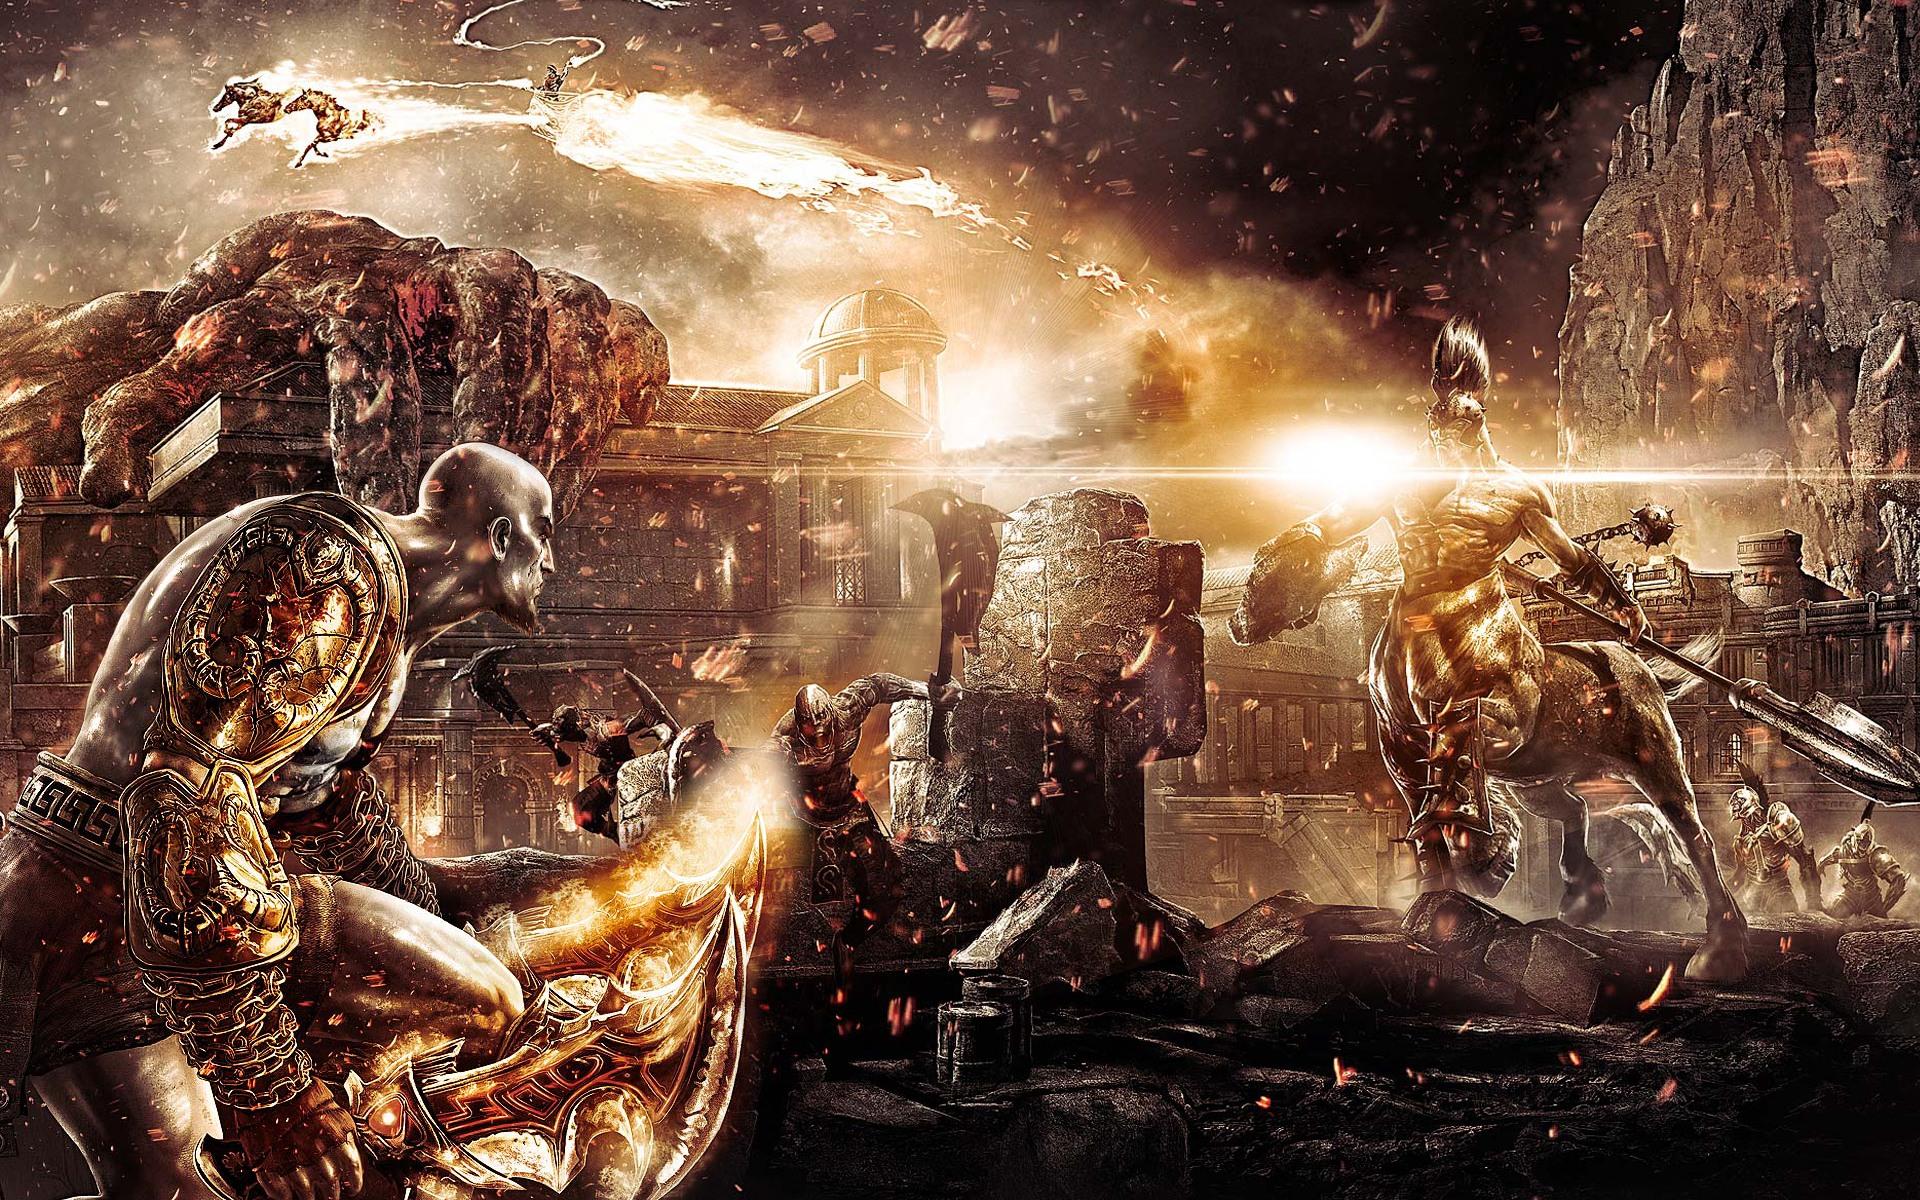 God Of War III Desktop Wallpaper 1920x1200